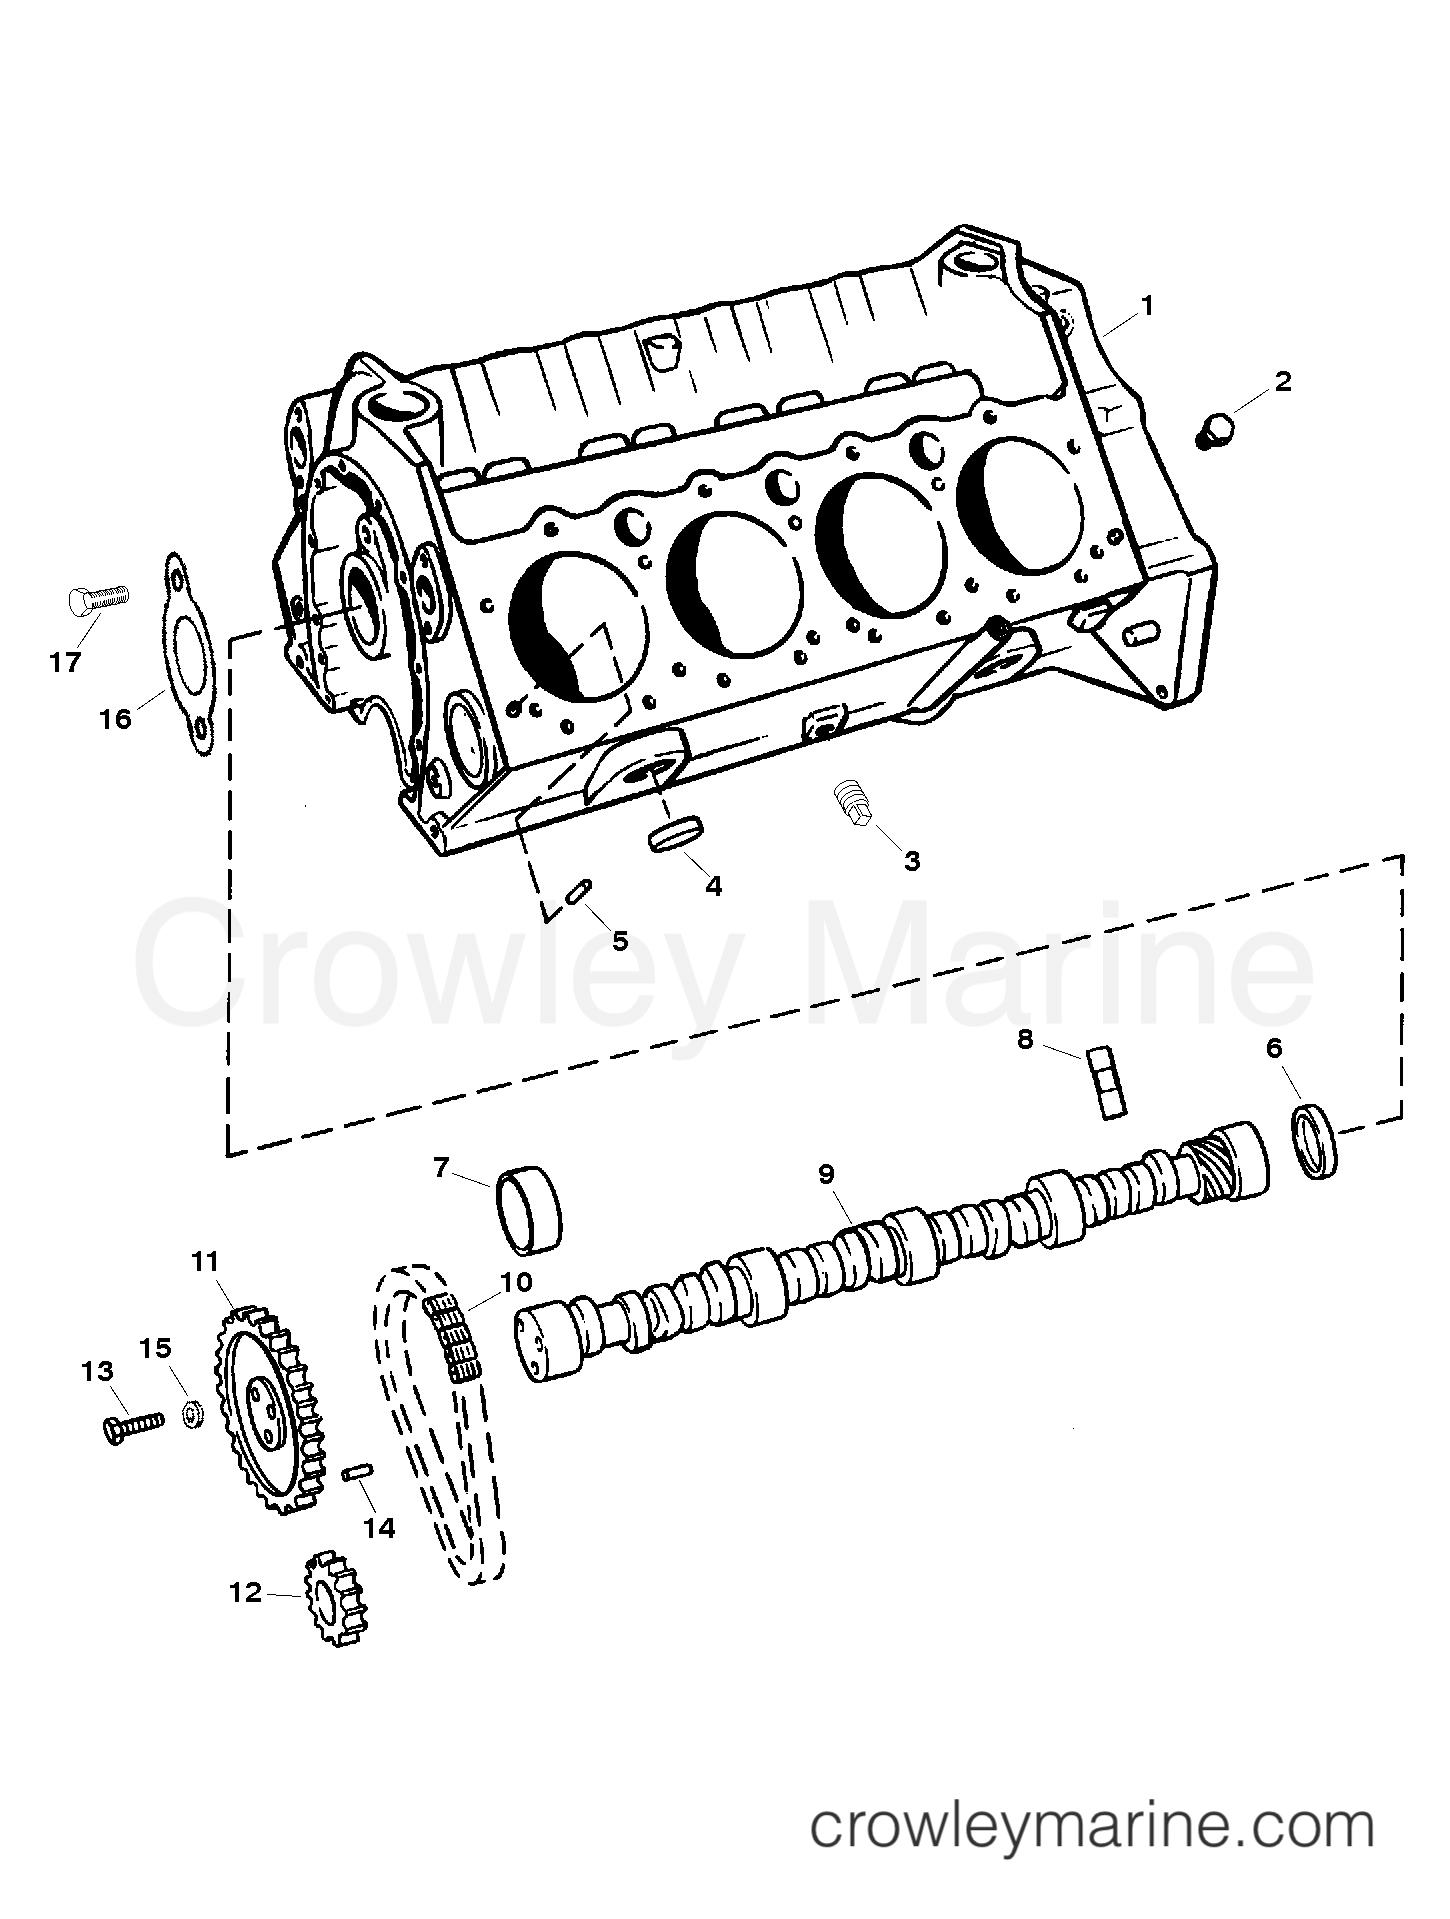 Cylinder Block And Camshaft